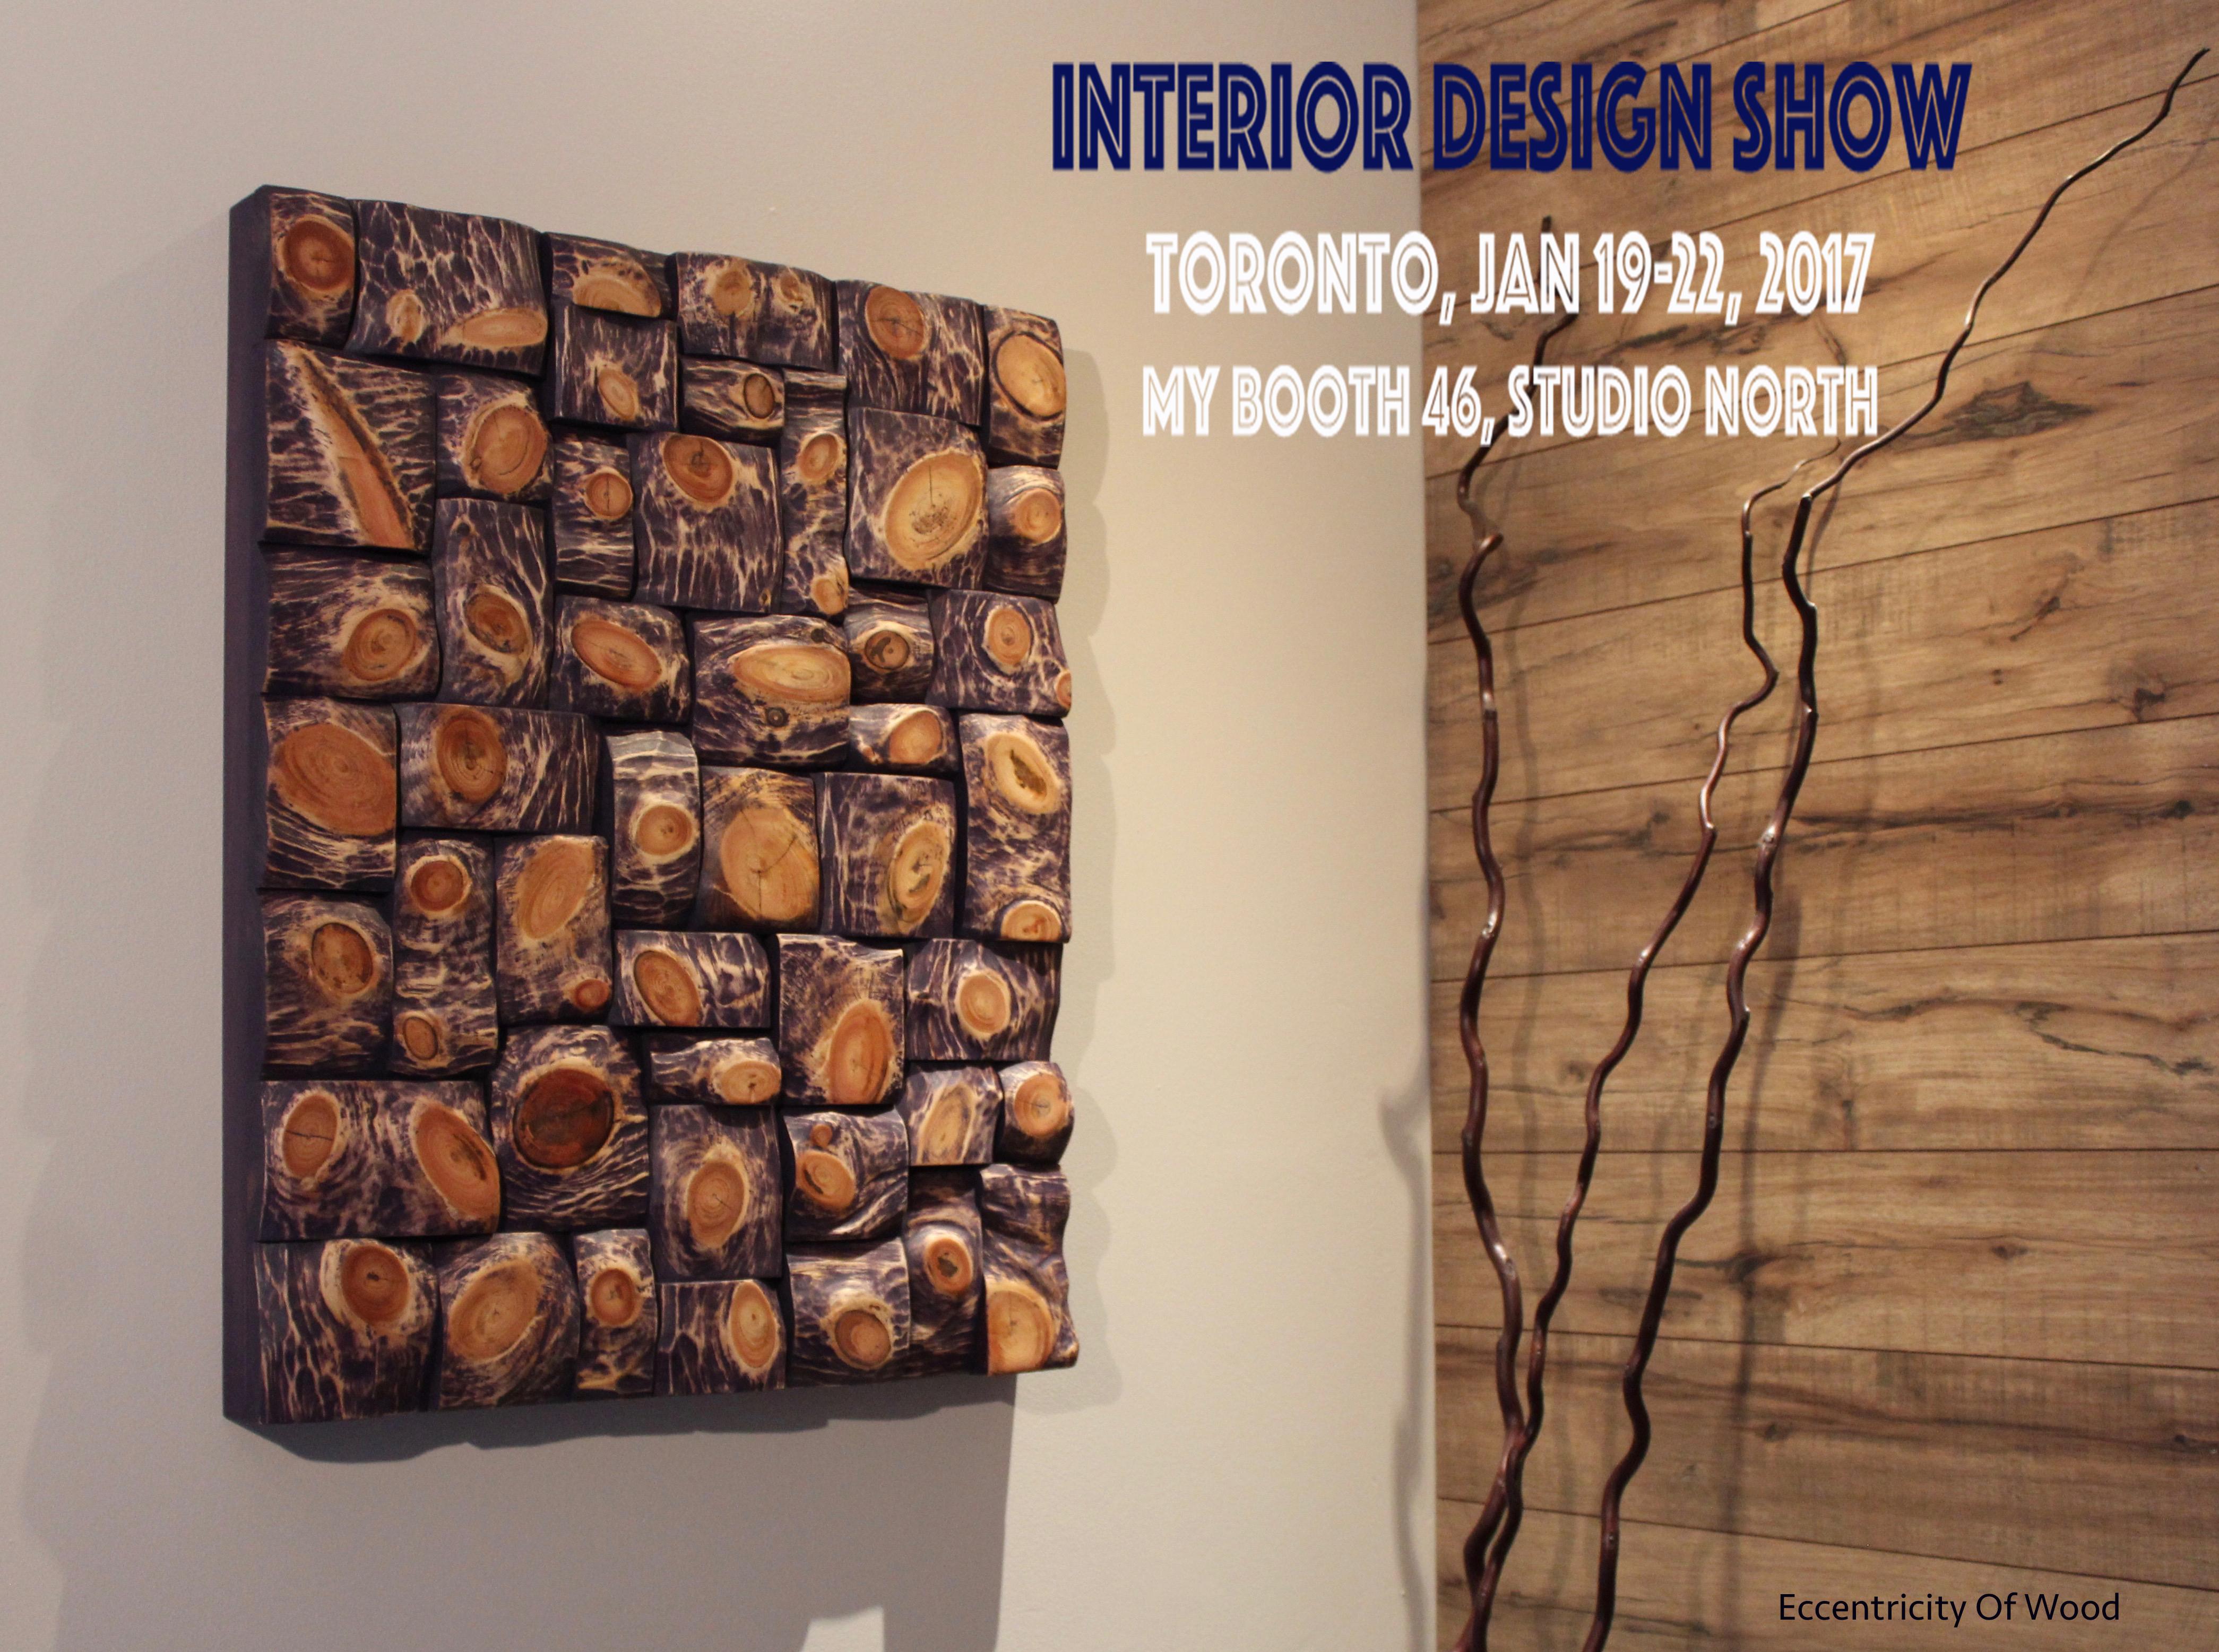 INTERIOR DESIGN SHOW TORONTO Eccentricity Of Wood